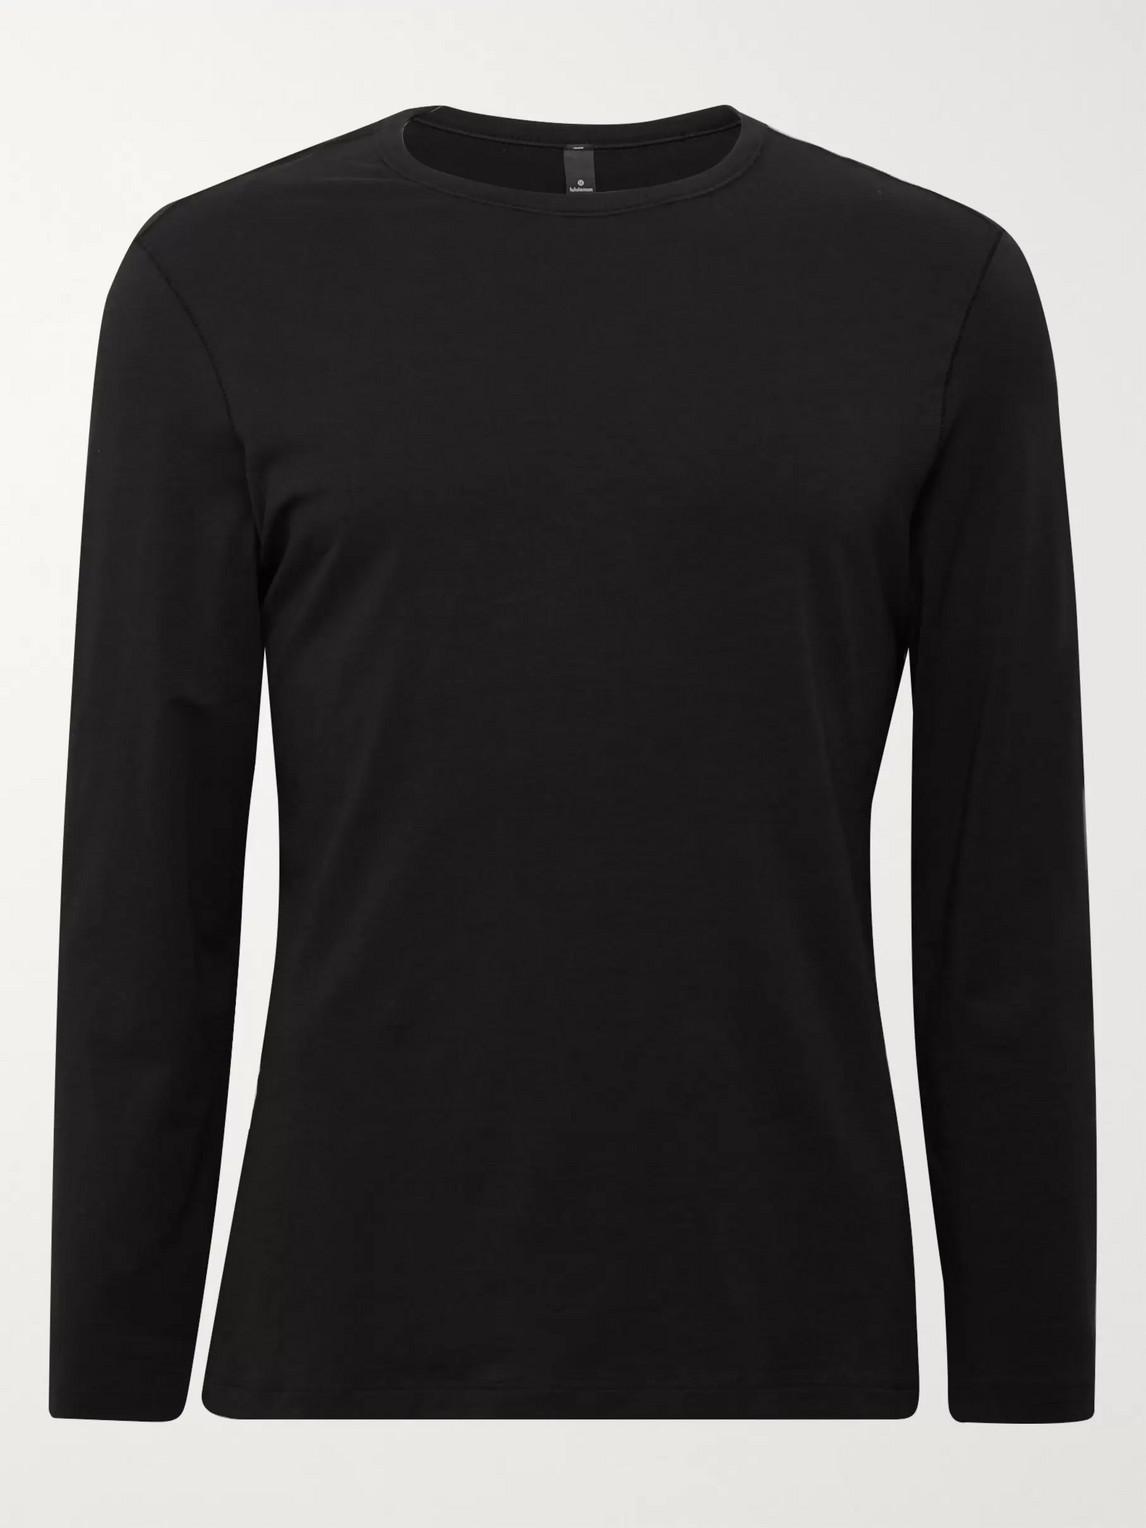 lululemon - 5 year basic vitasea t-shirt - men - black